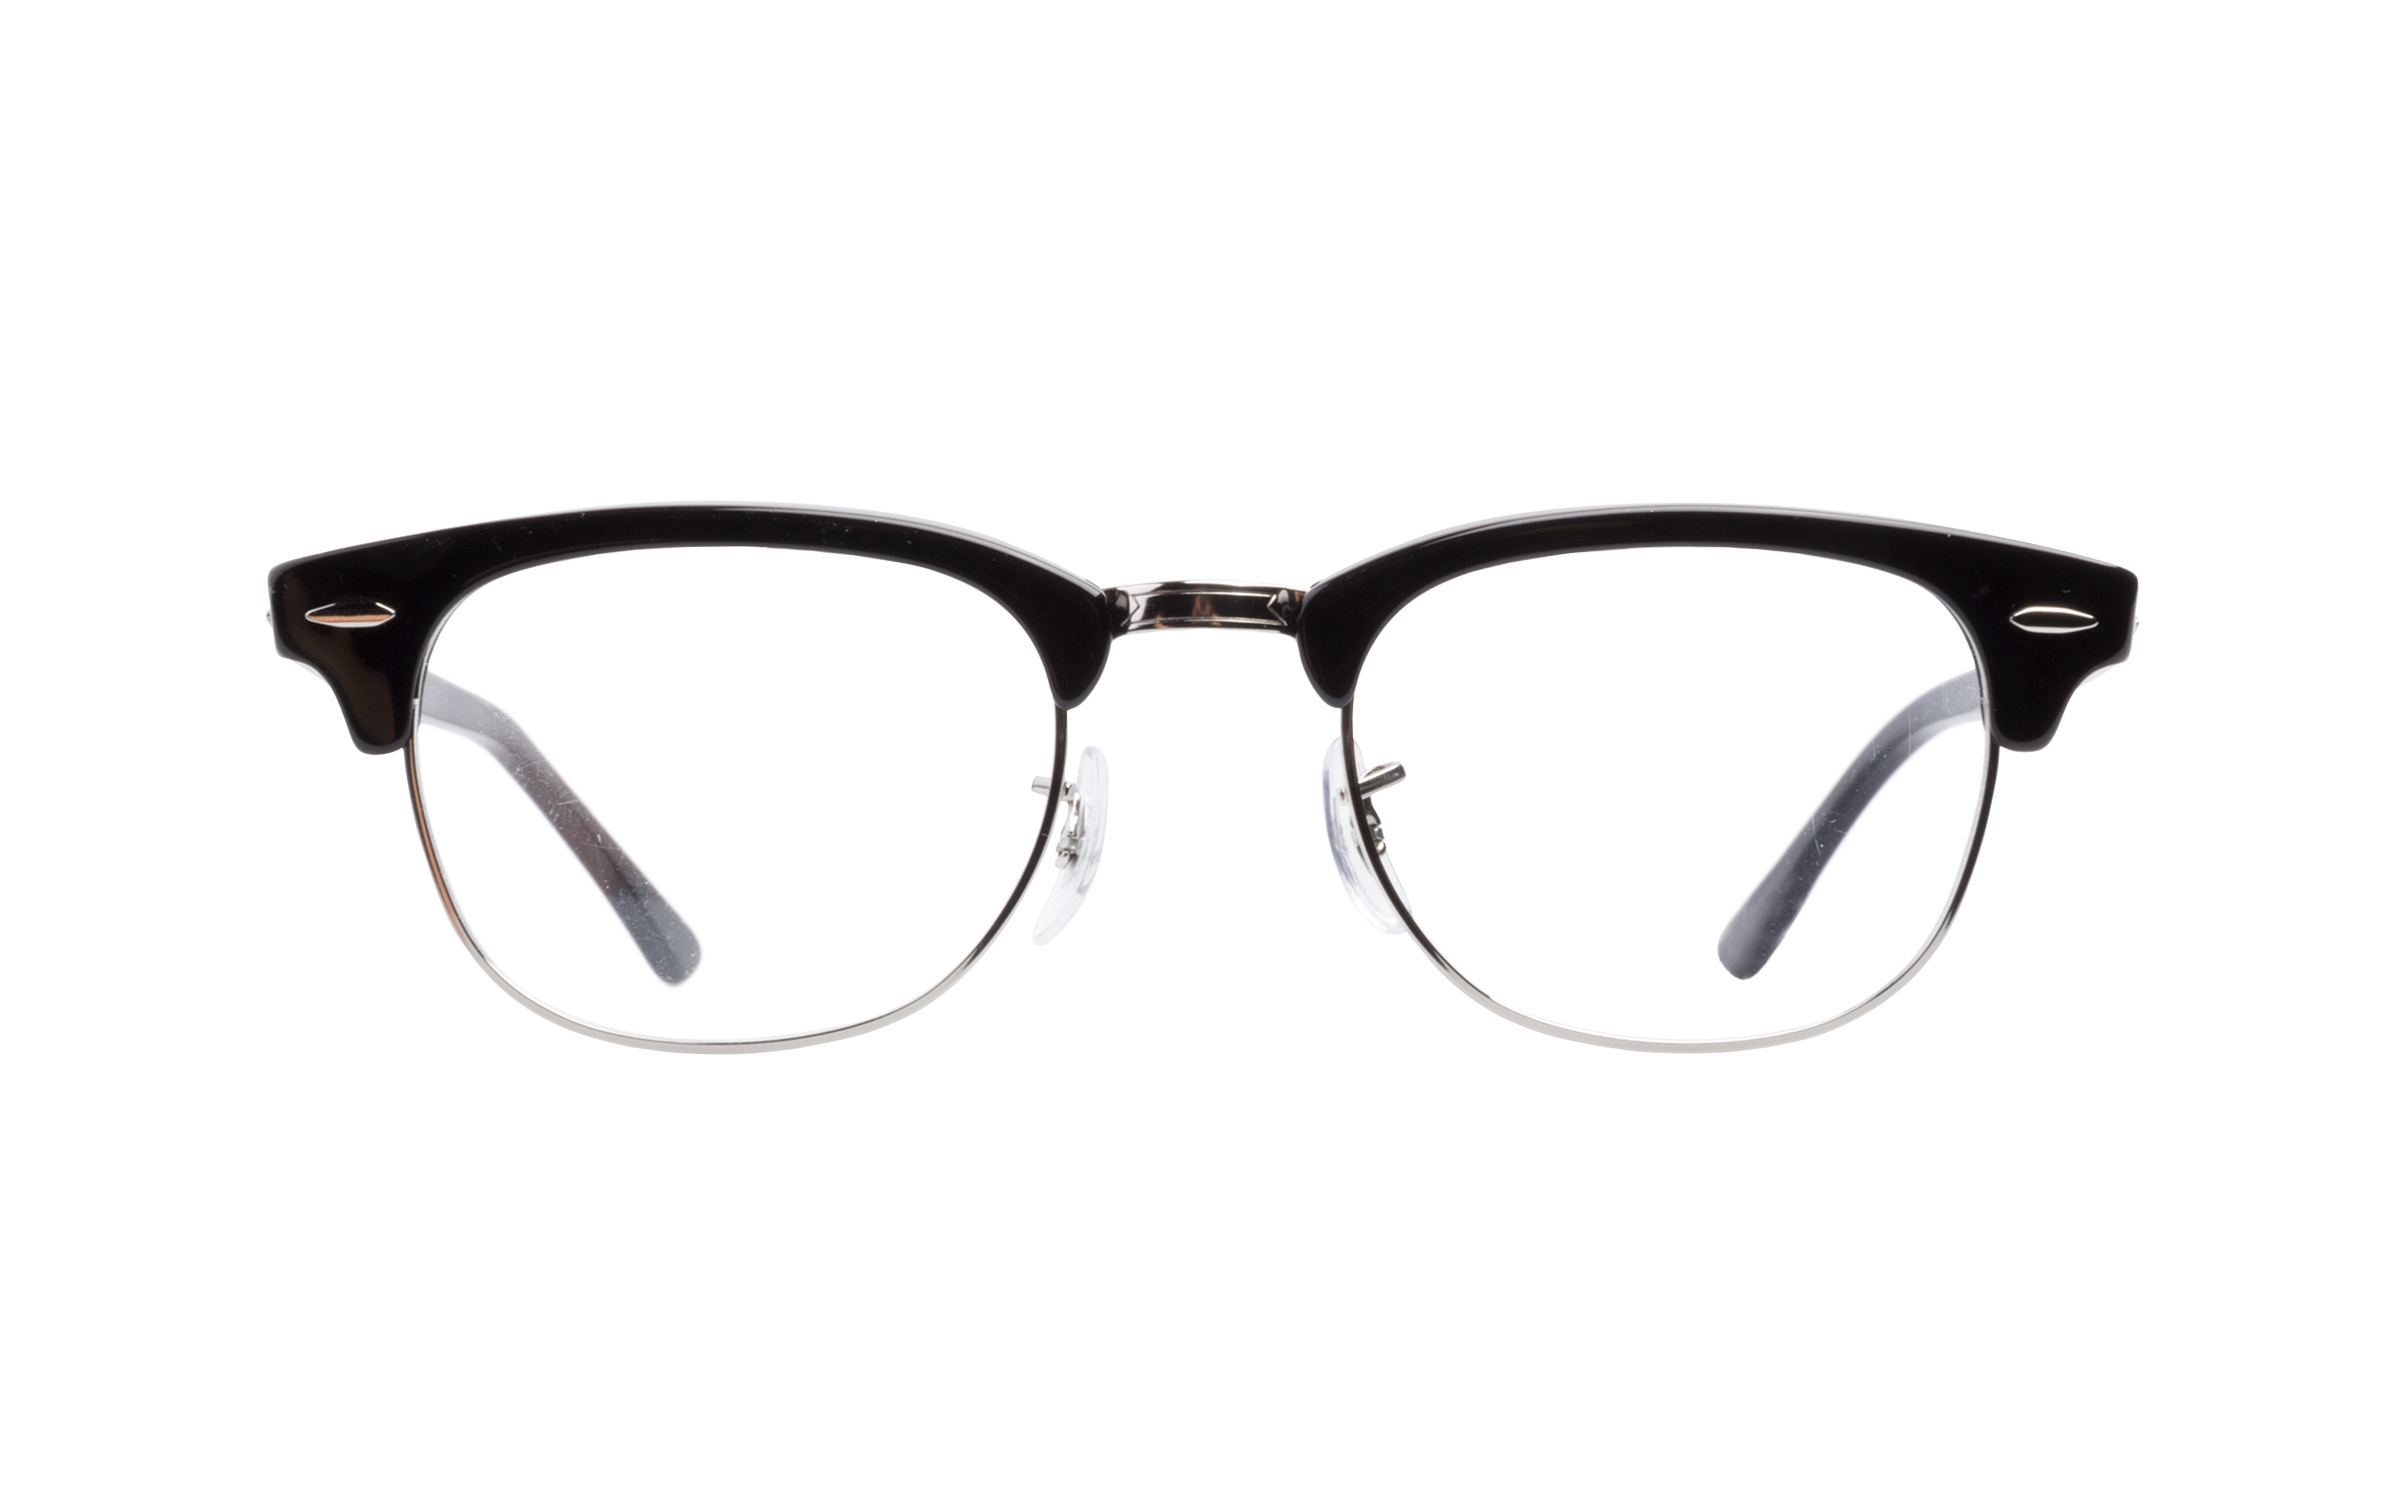 Ray-Ban Glasses Retro Black Online Coastal